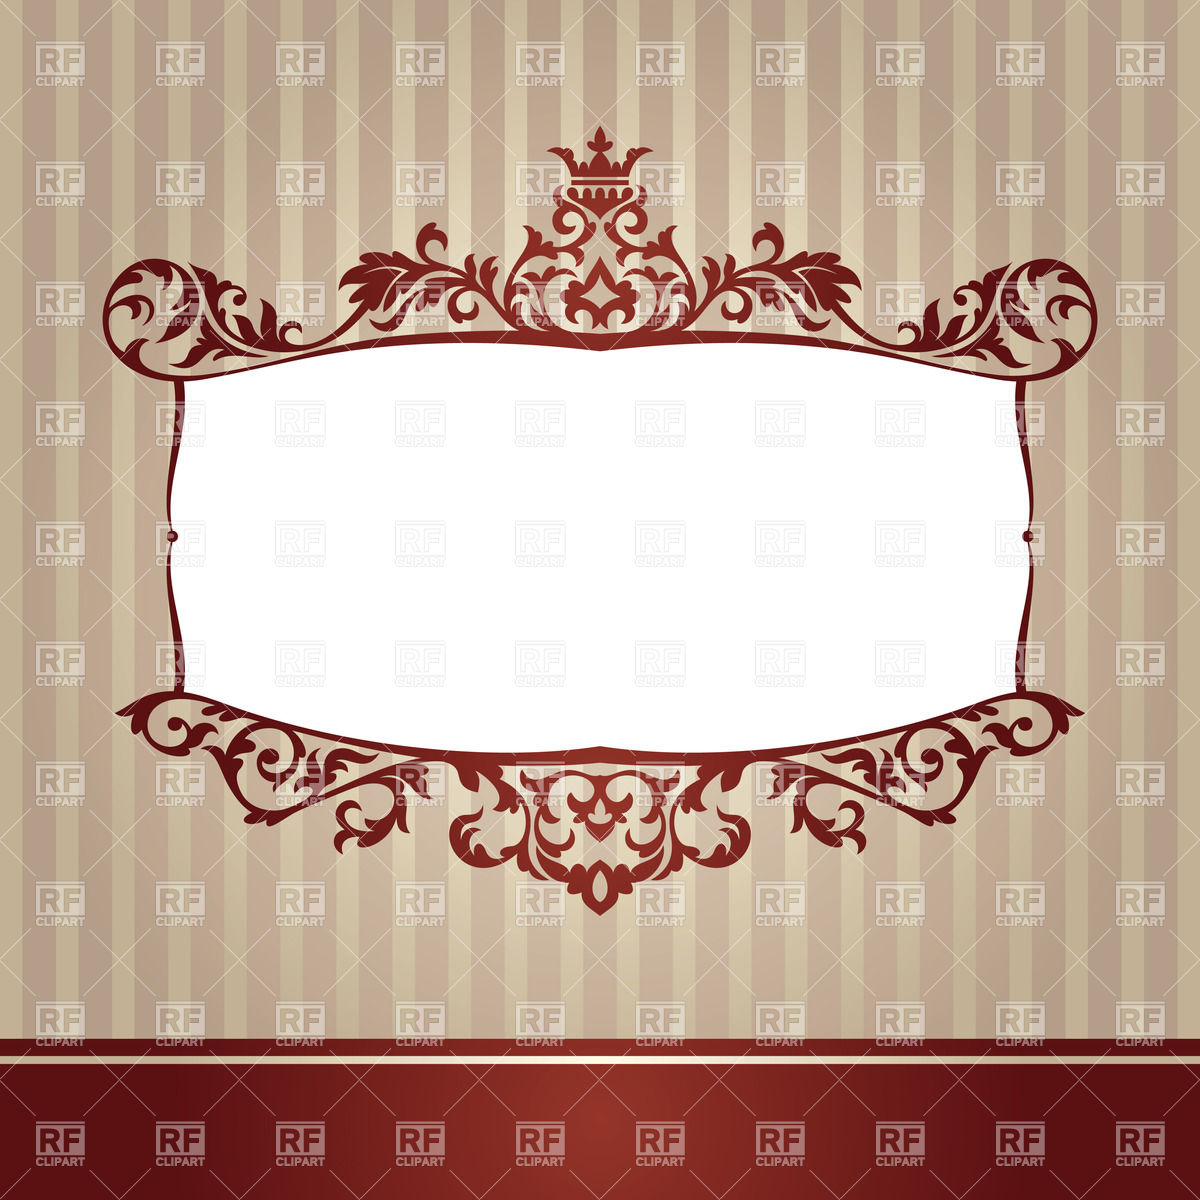 cute decorative frame clipart - Clipground